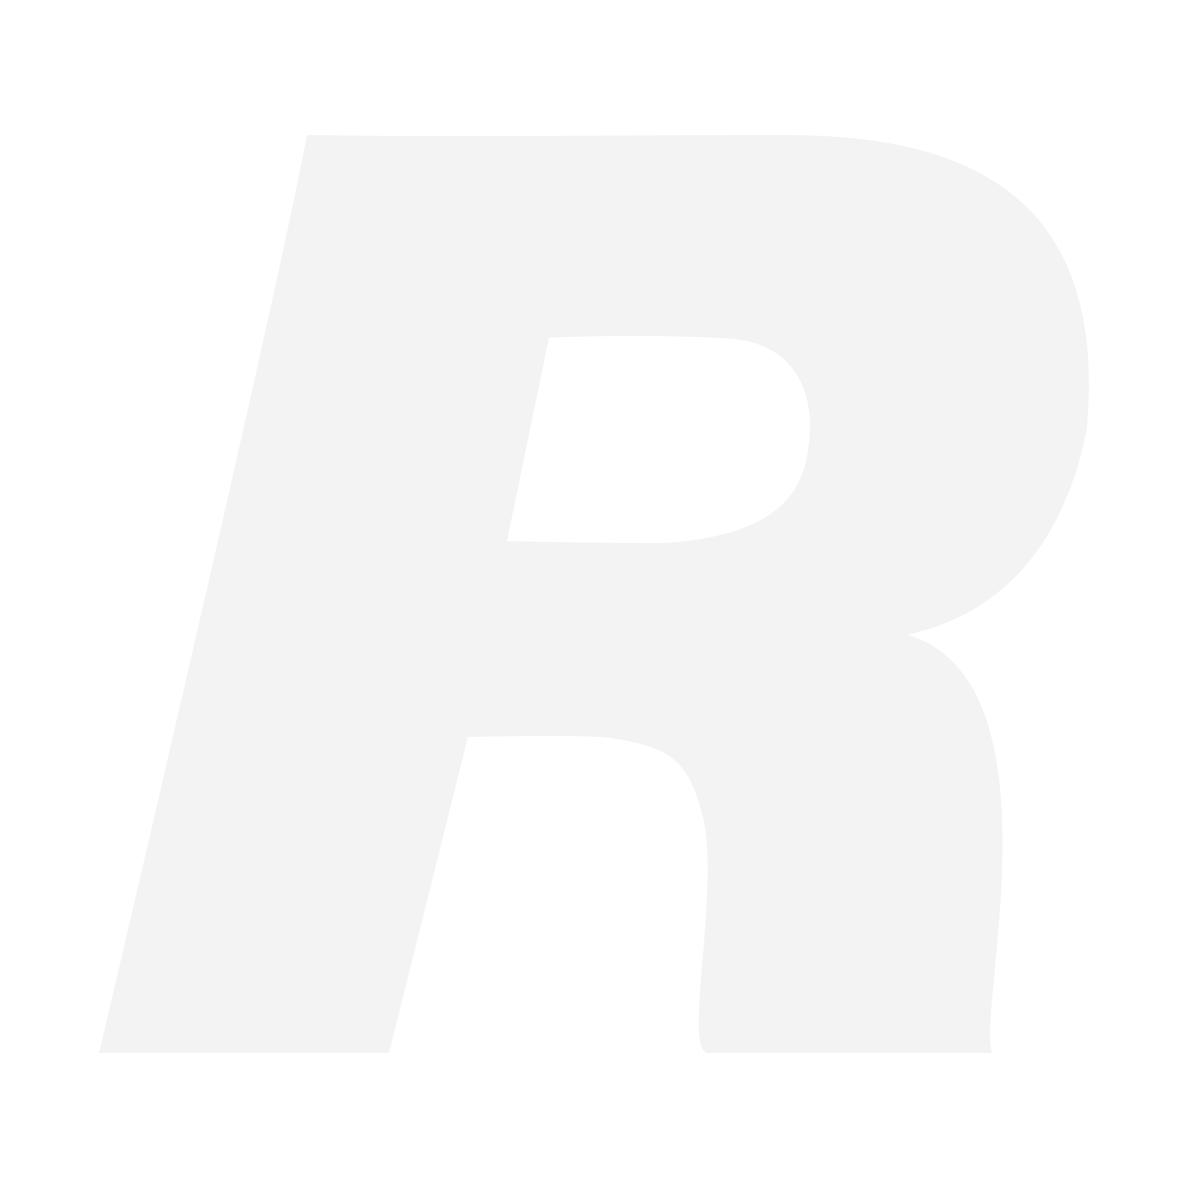 Nikon Flytande Rem till AW Serien